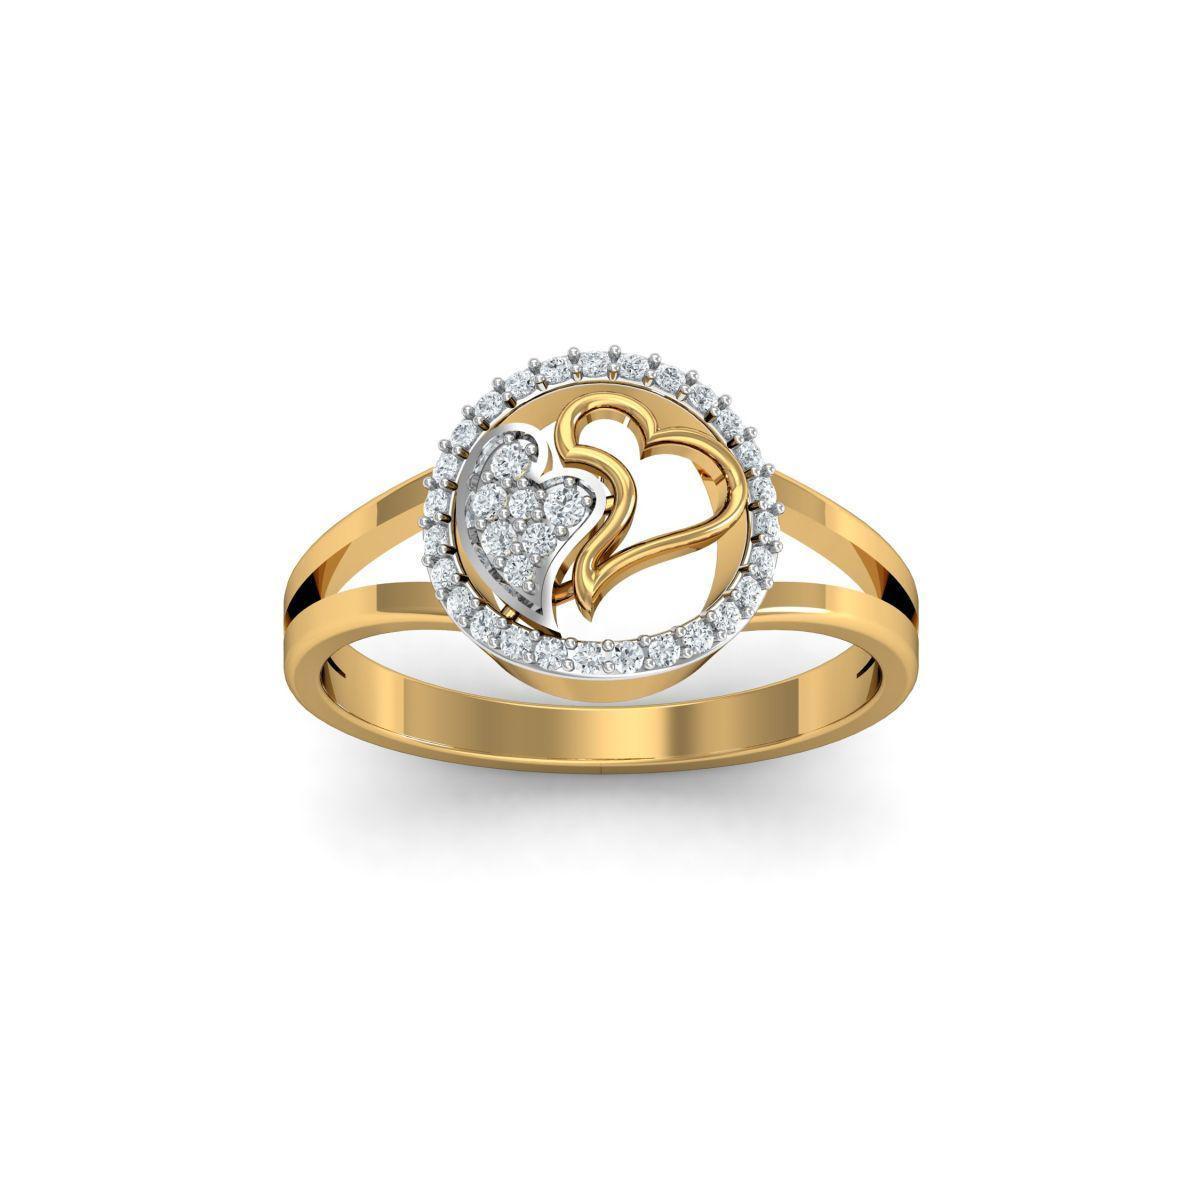 Diamoire Jewels 18kt Yellow Gold Pave 0.18ct Diamond Infinity Ring II - UK G 1/4 - US 3 1/2 - EU 45 3/4 YaZMjN